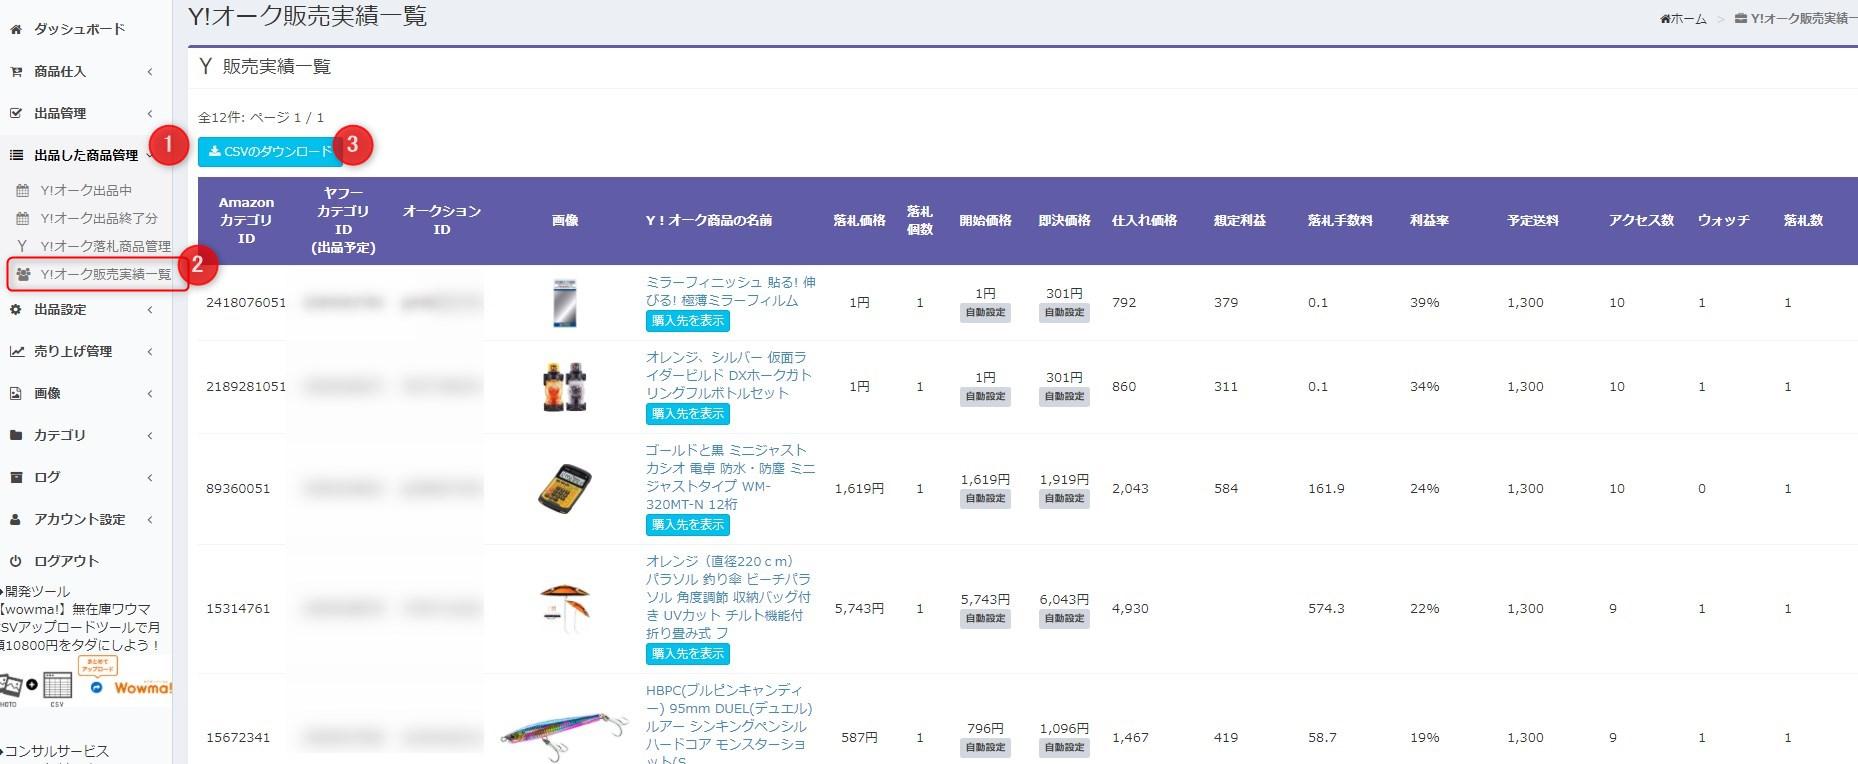 2020 09 25 11h18 40 【TOOL】売れやすい・売れた商品一覧が一目でわかる!販売実績一覧導入